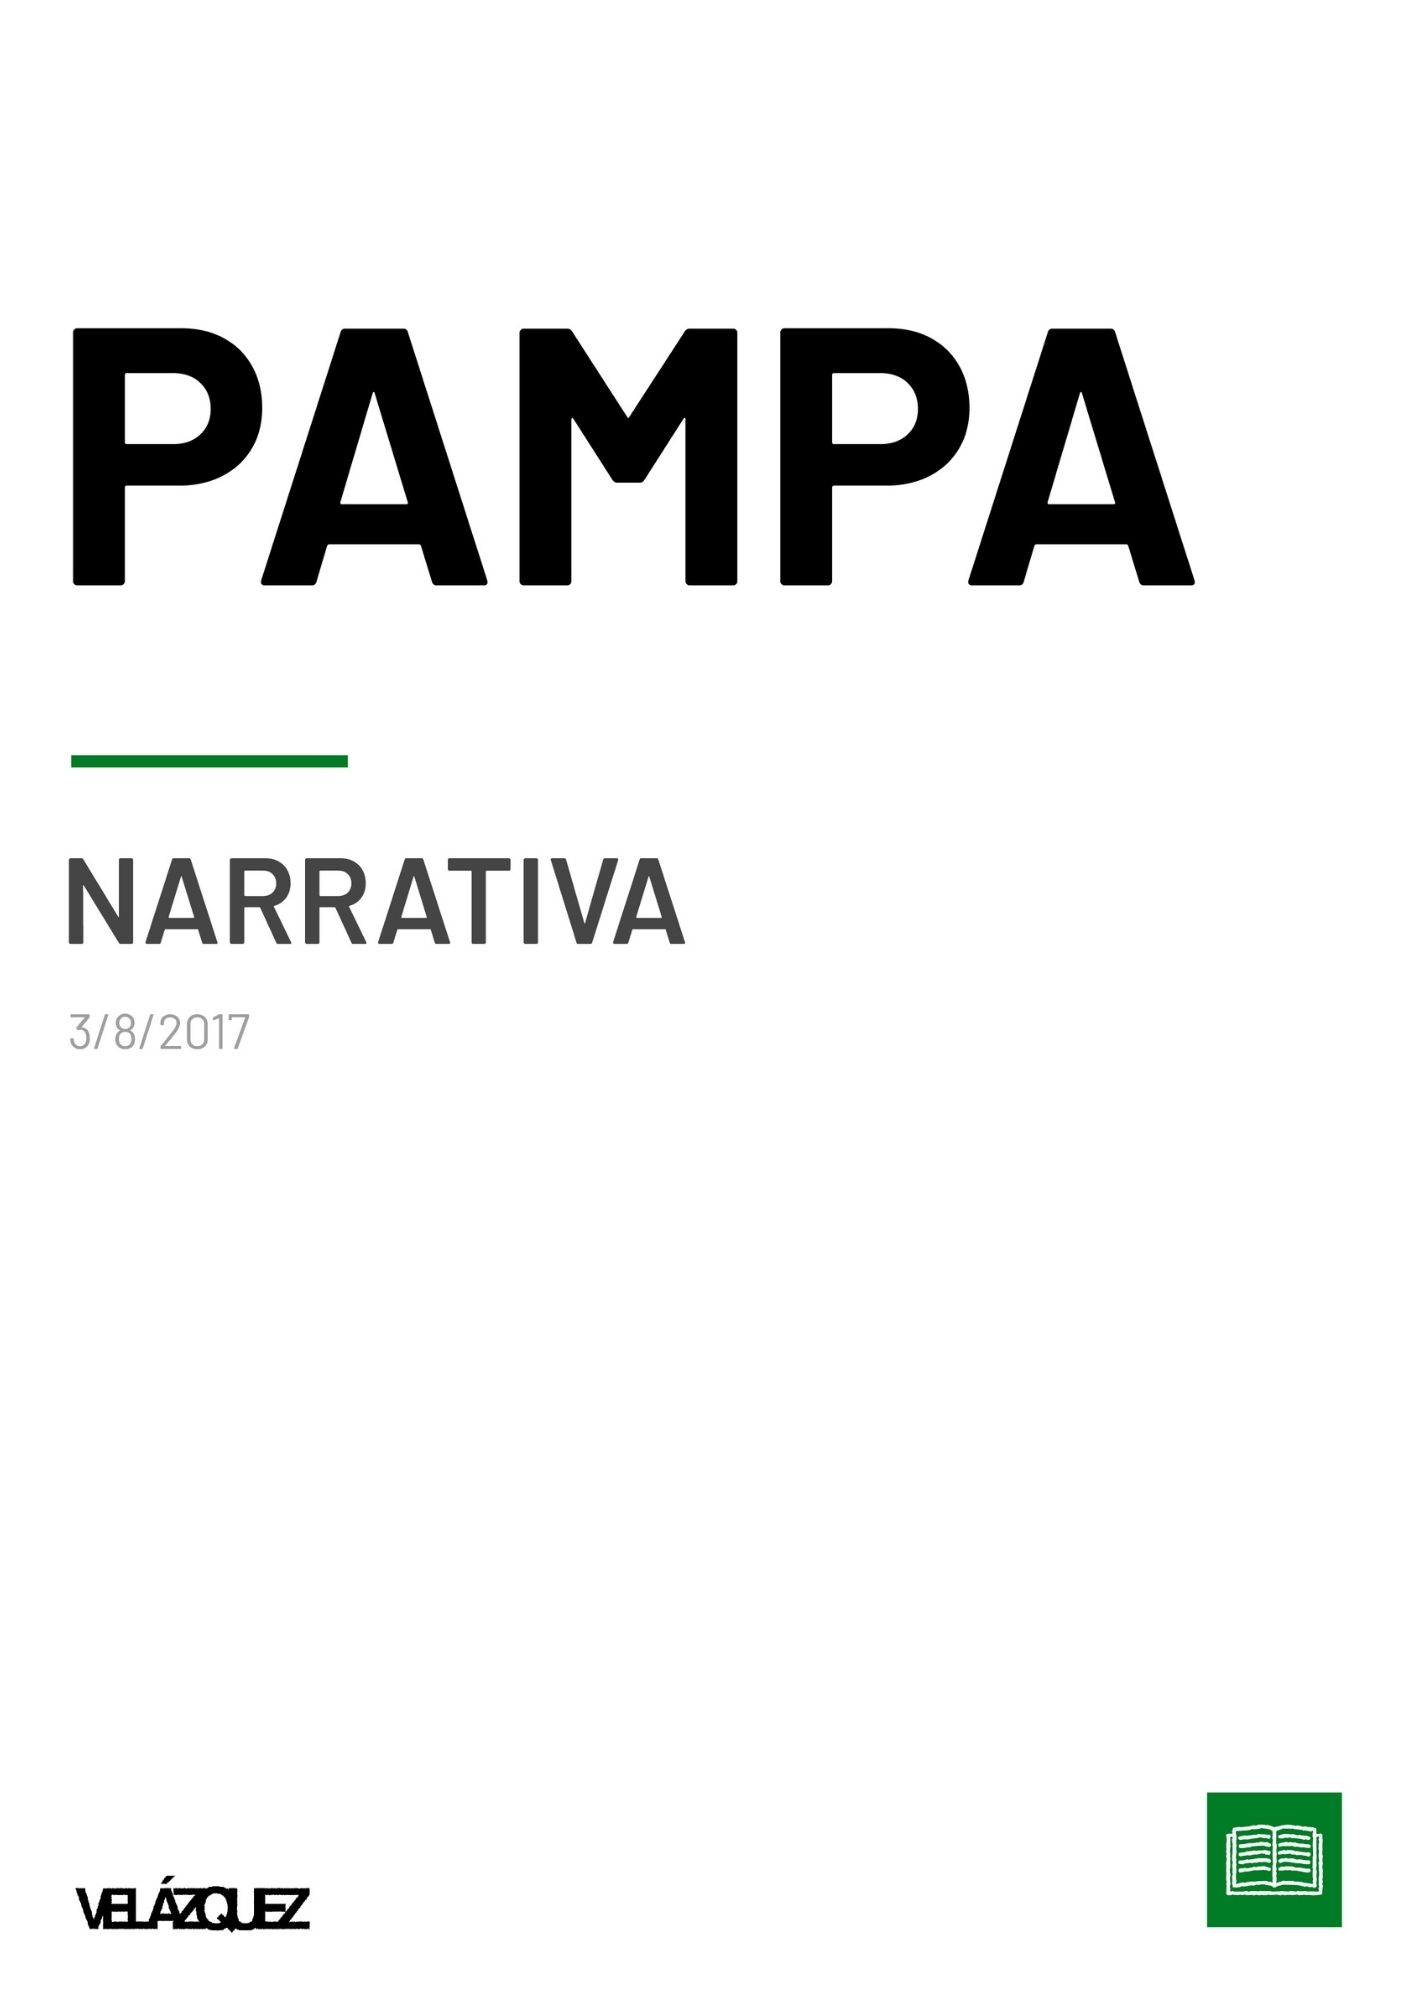 Pampa - Narrativa - Fabri Velázquez